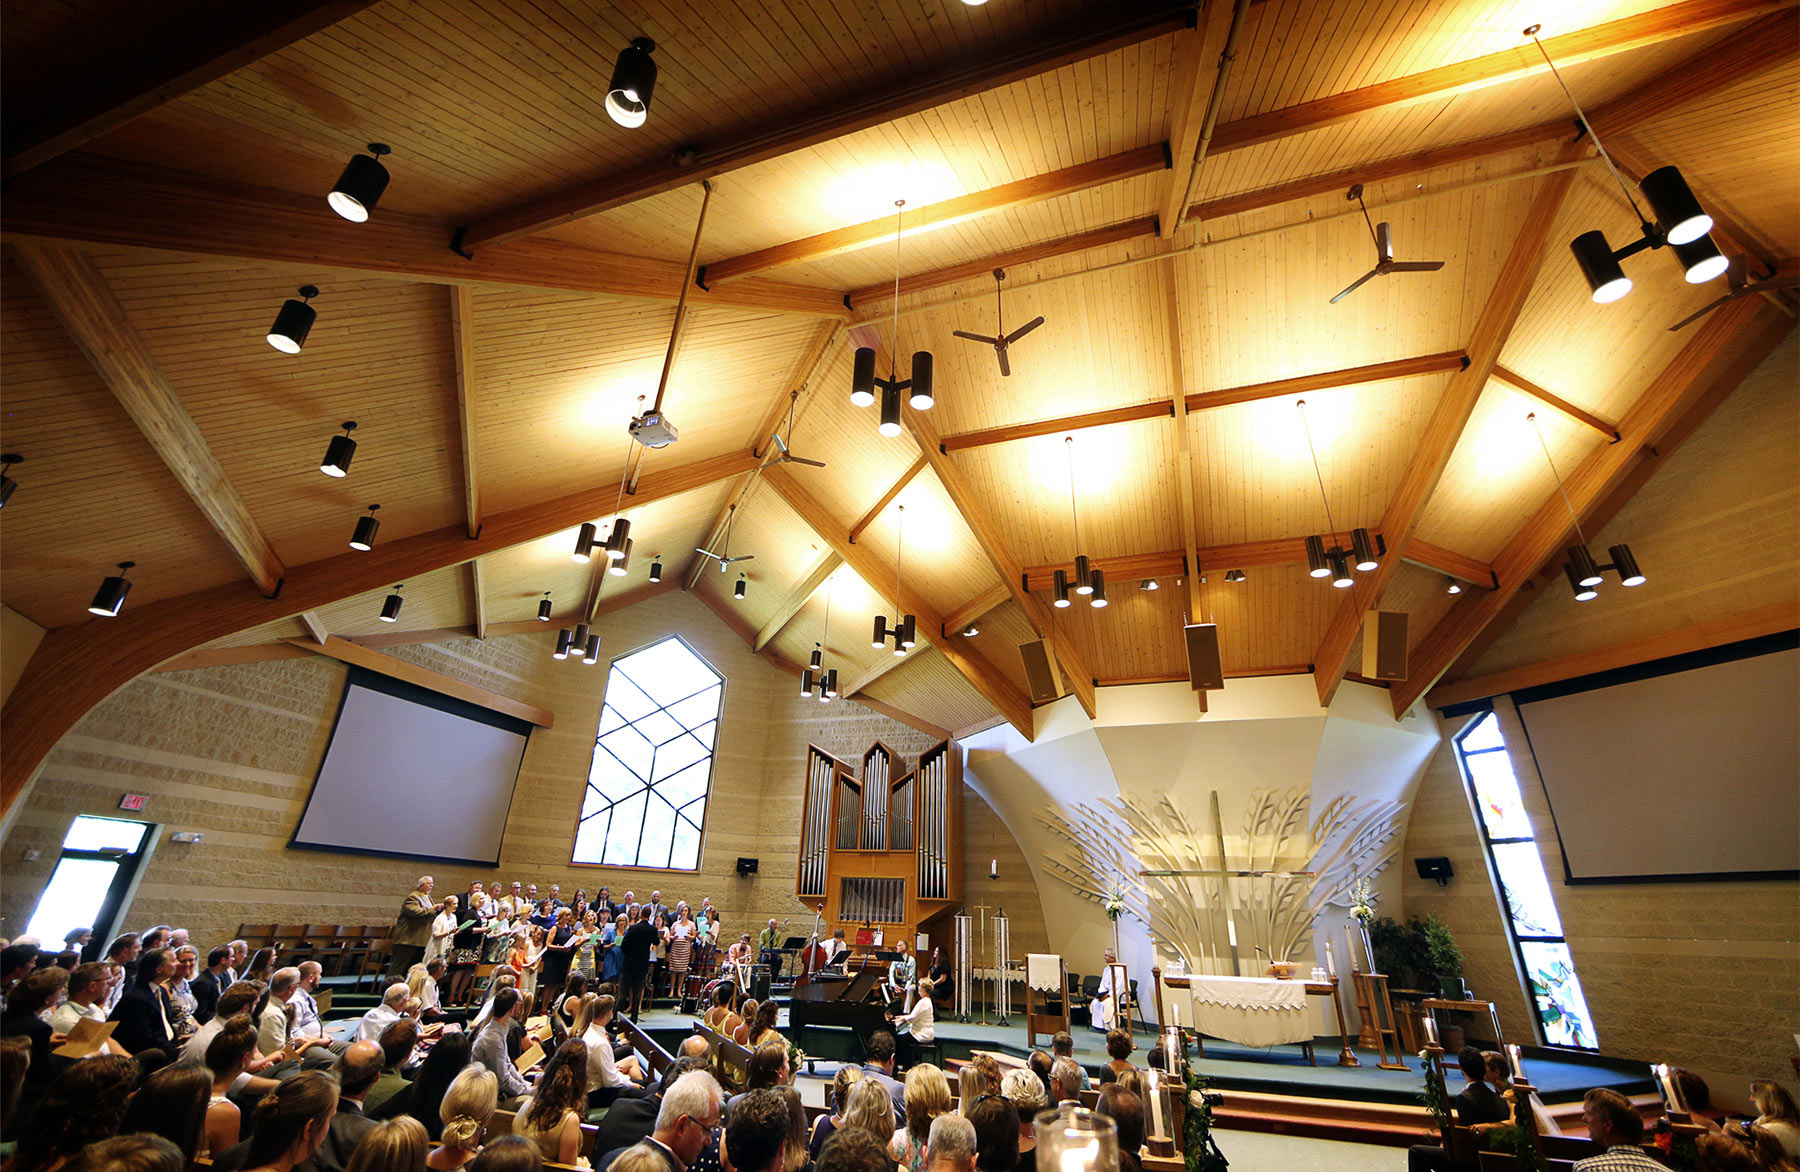 08-Minneapolis-Minnesota-Wedding-Photography-by-Vick-Photography-St-Stephen-Lutheran-Church-Ceremony-Sarah-&-Tom.jpg